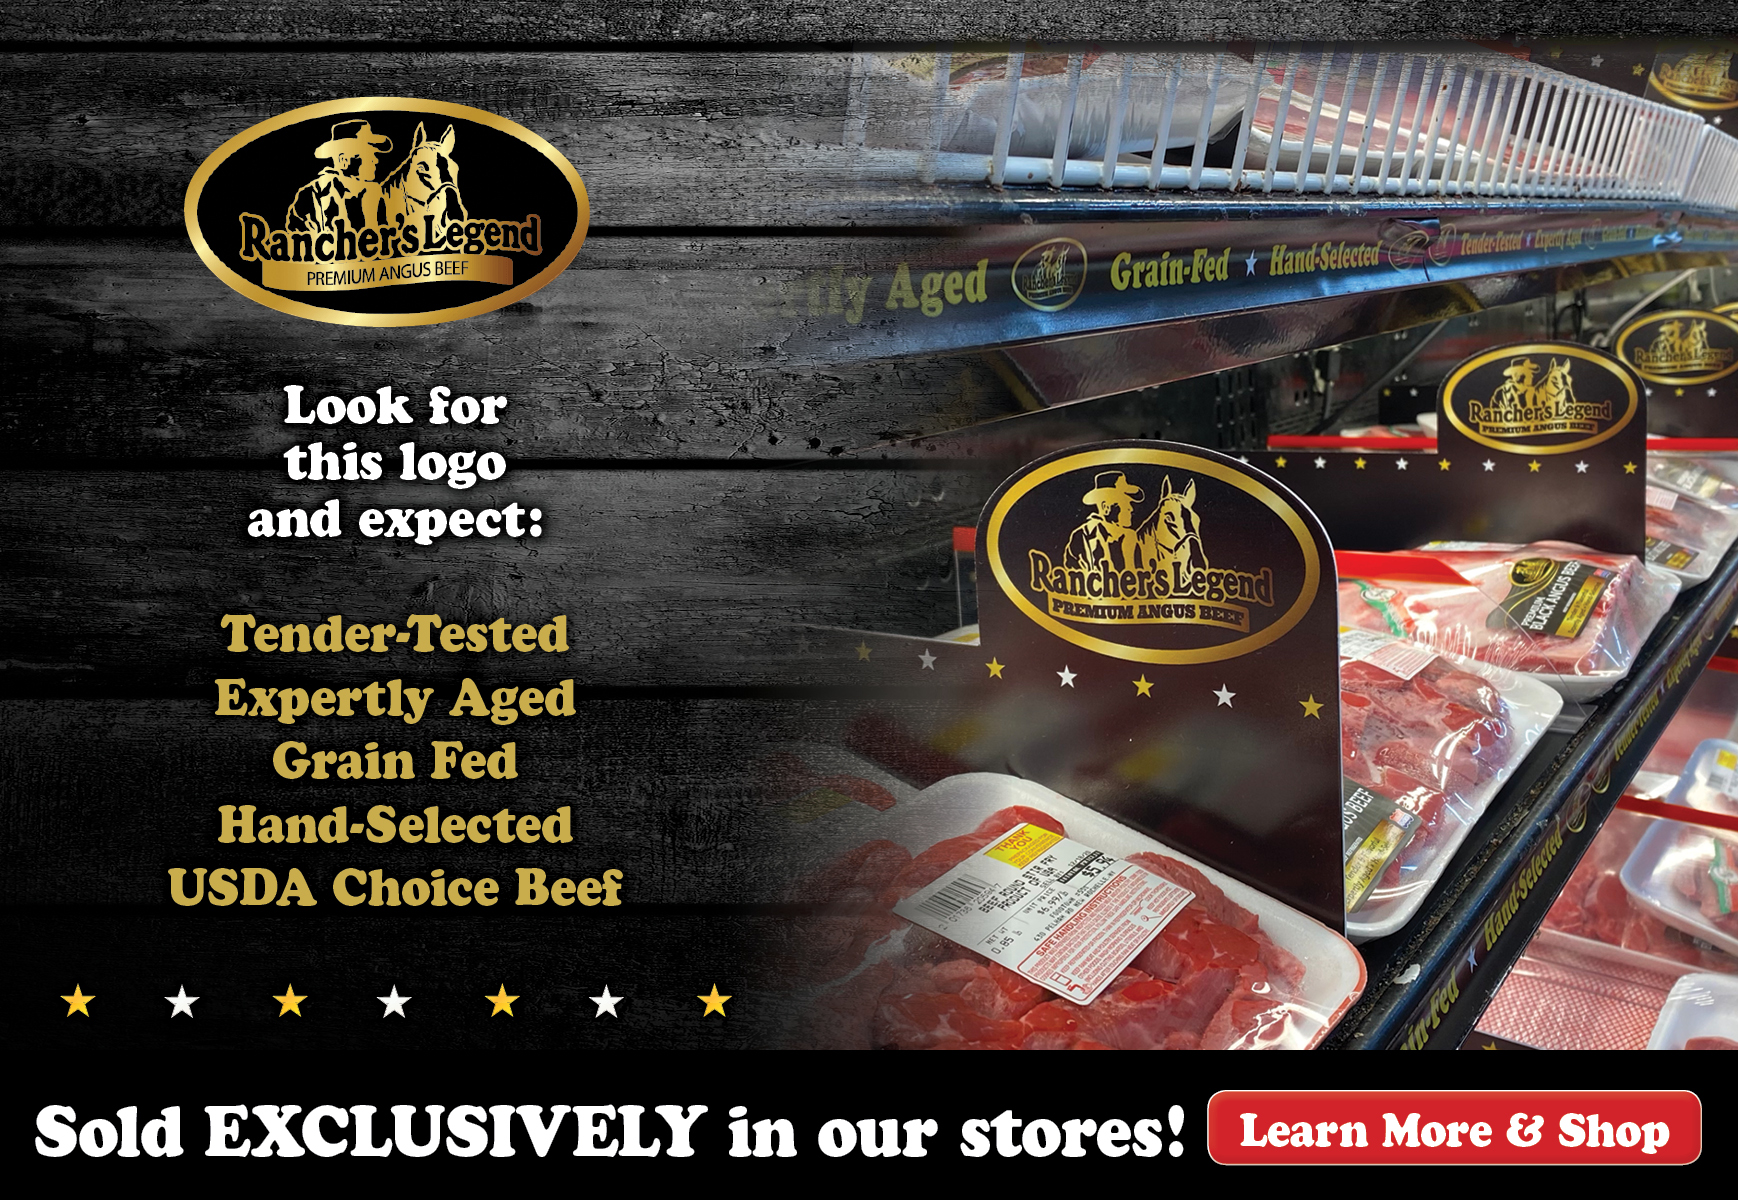 various Rancher's Legend premium black angus beef products